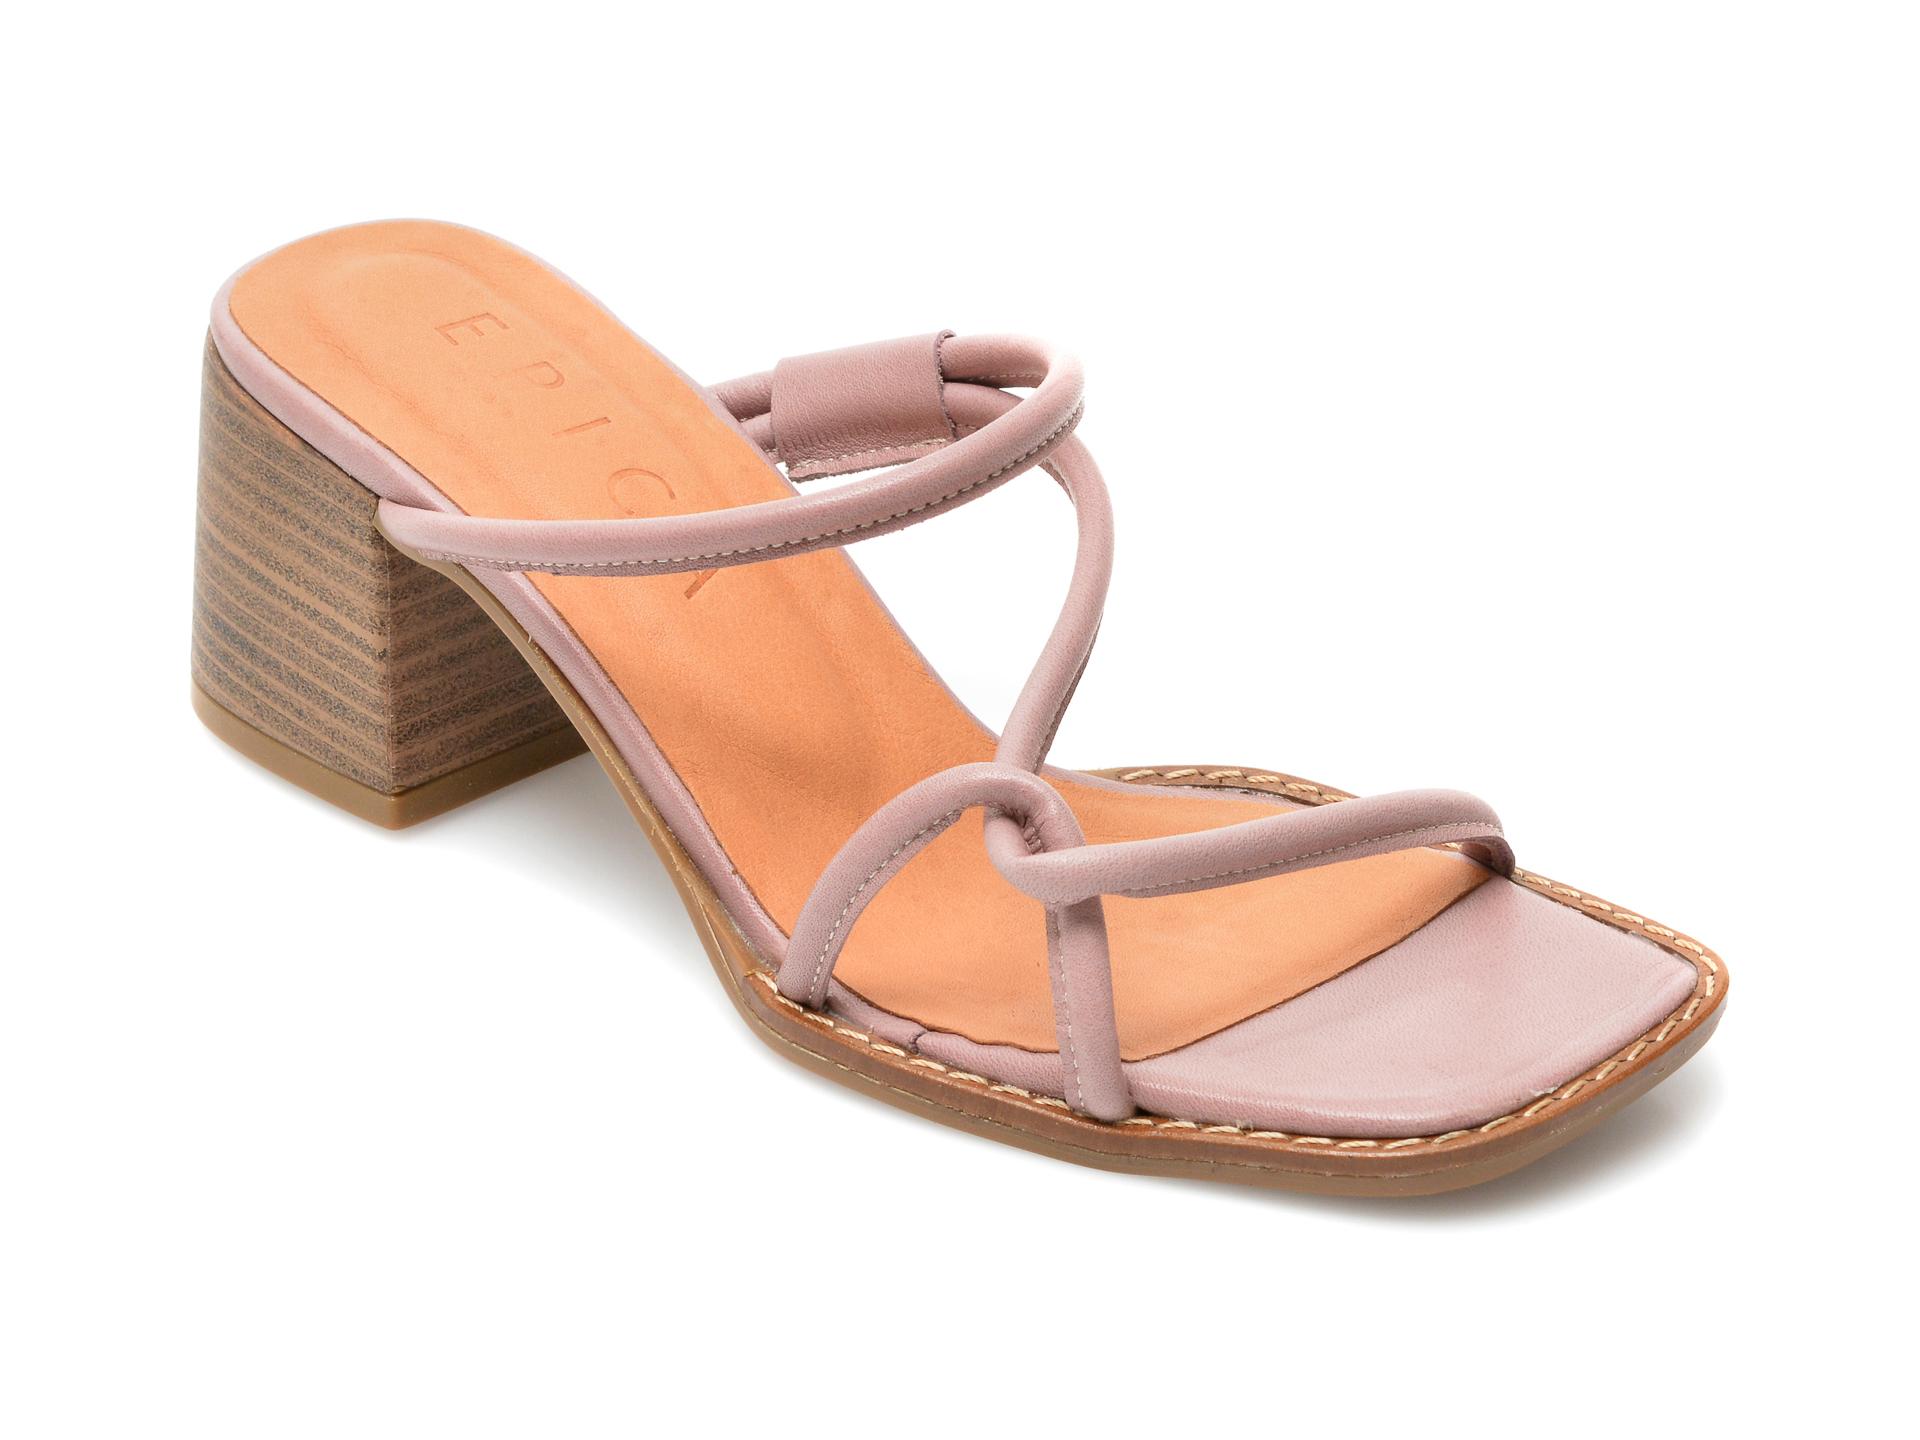 Papuci EPICA mov, 15101, din piele naturala